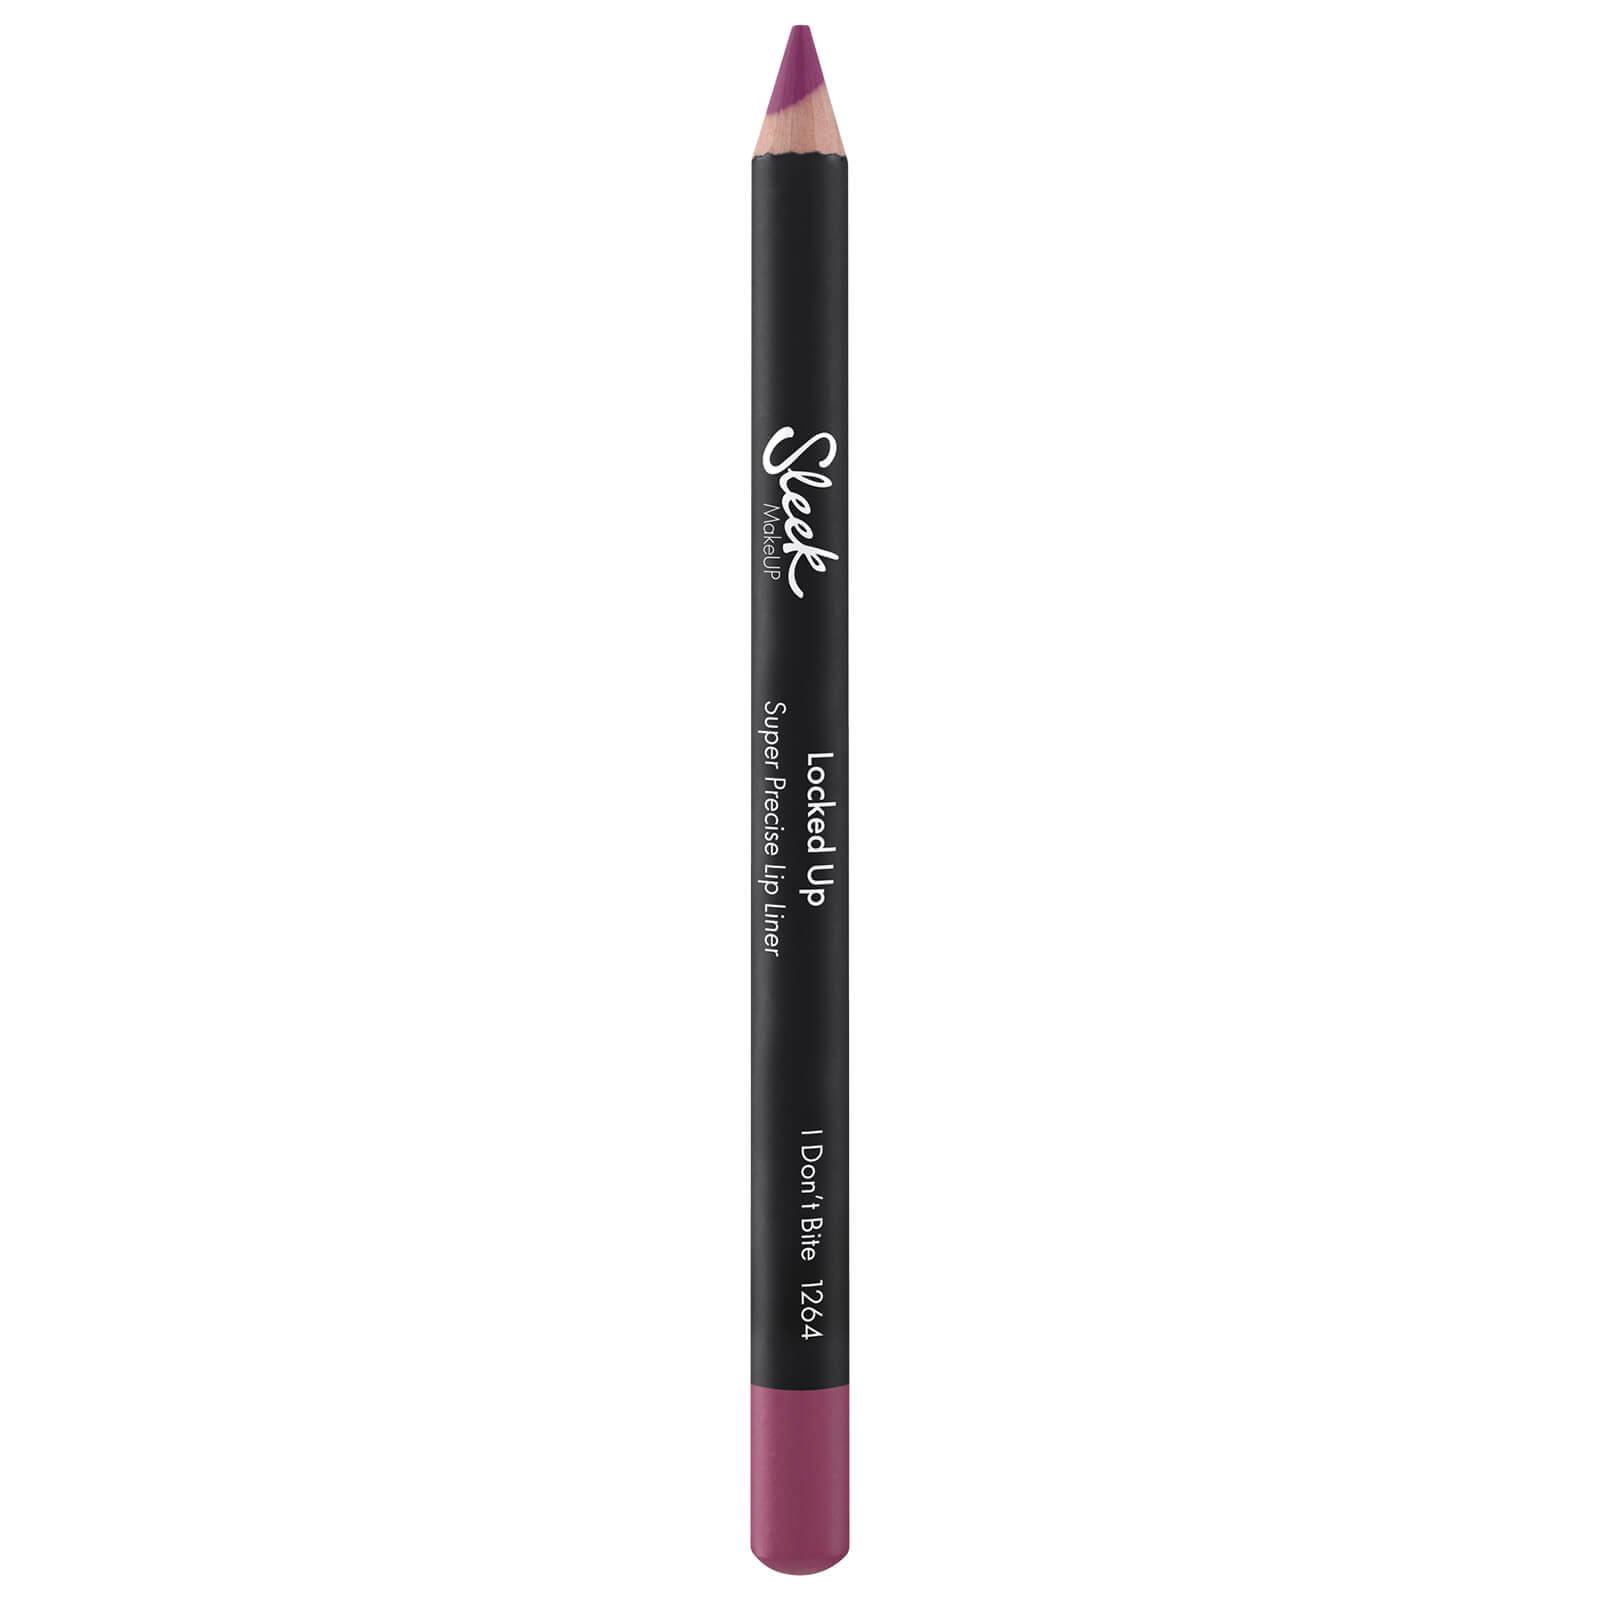 Sleek MakeUP Locked Up Super Precise Lip Liner (Various Shades) - I Don't Bite